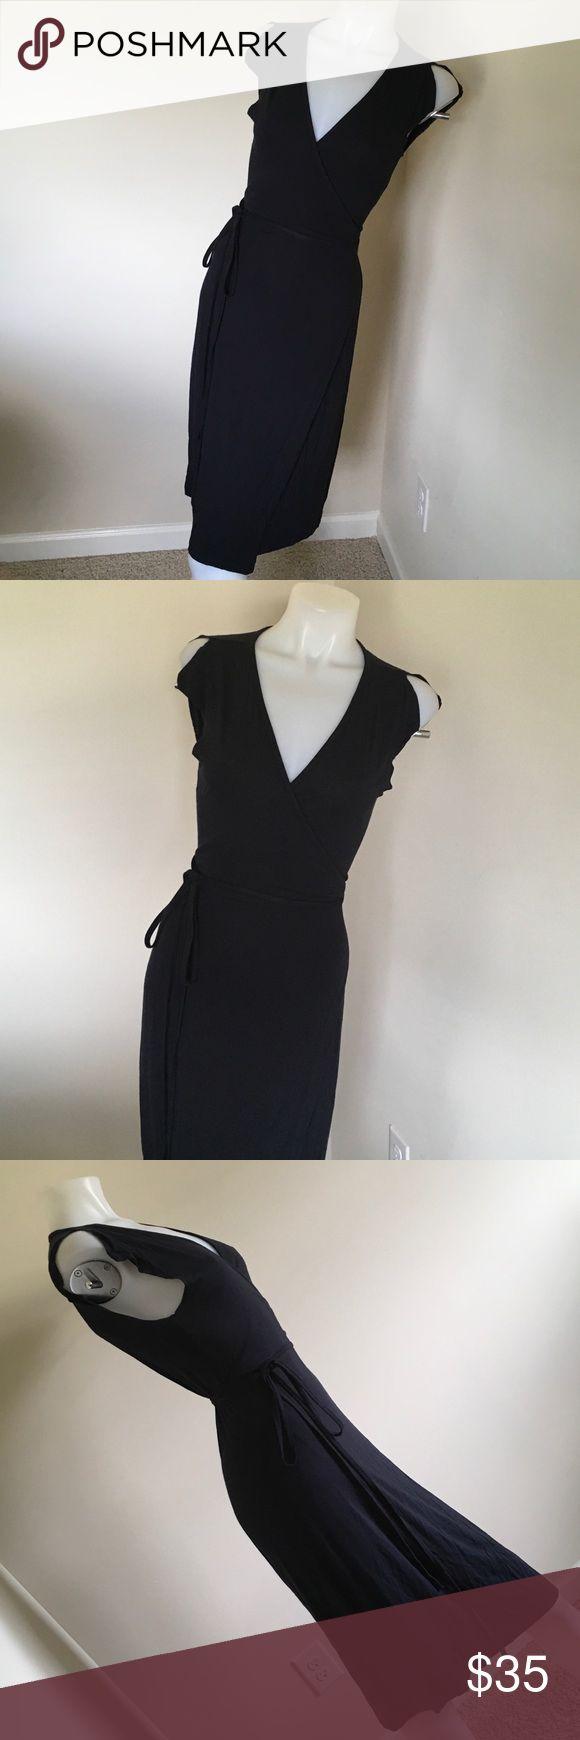 Black J.Crew wrap dress (2500) this dress is very cute thin material please check tags J. Crew Dresses Midi